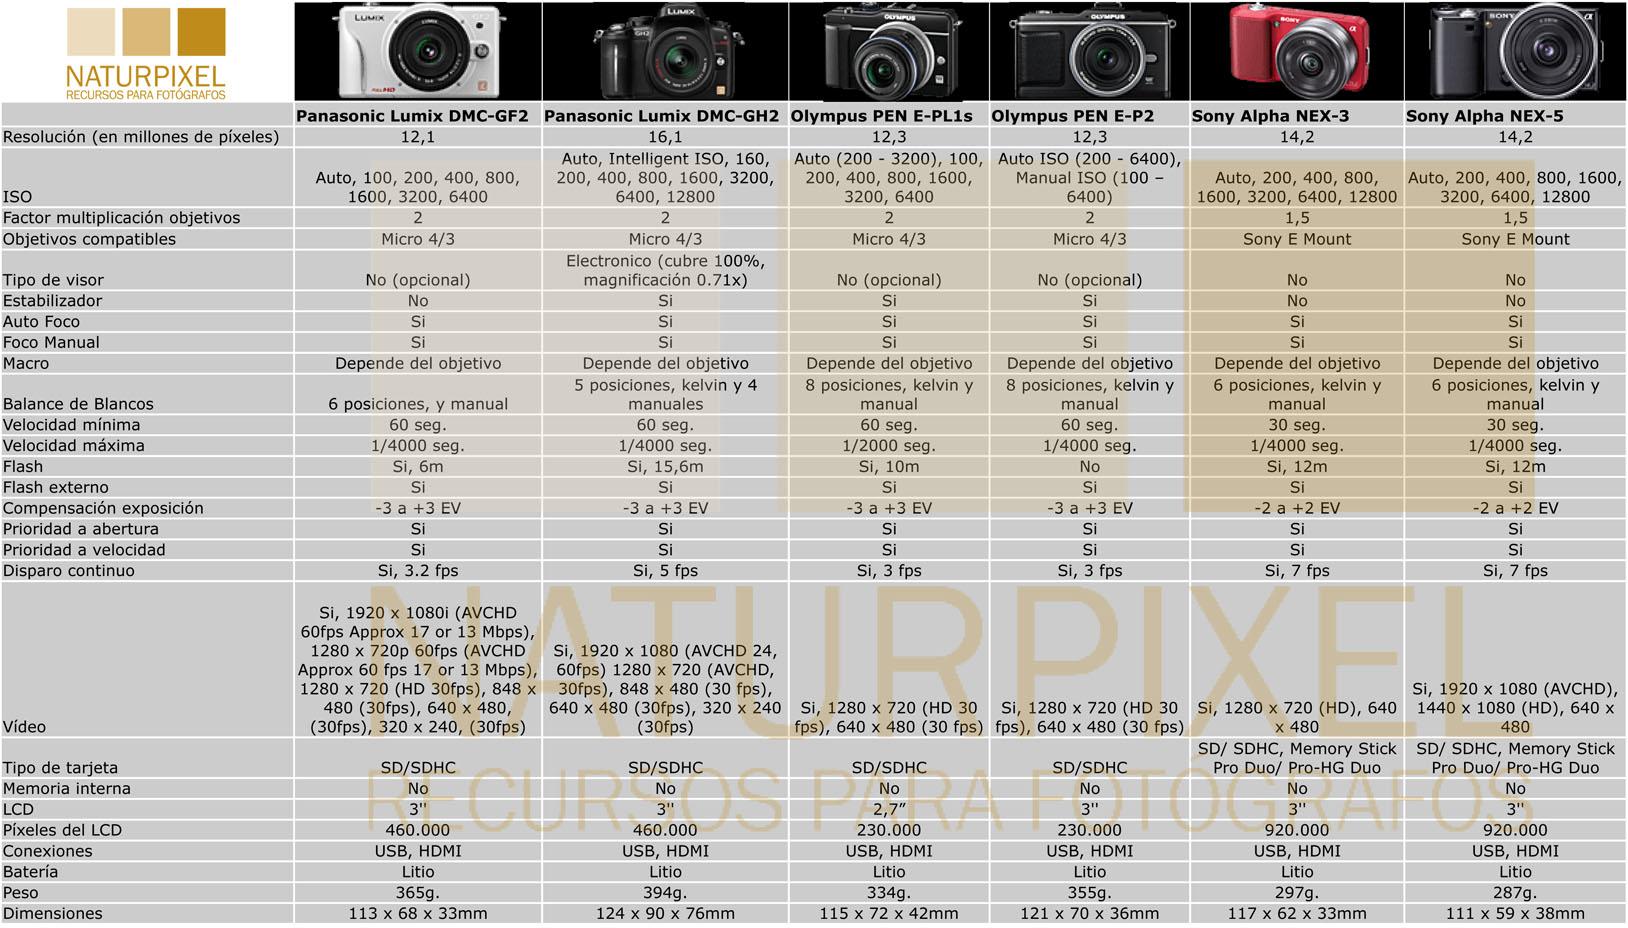 Especial Navidad 2010. ¿Qué cámara Compacta SLR me compro?